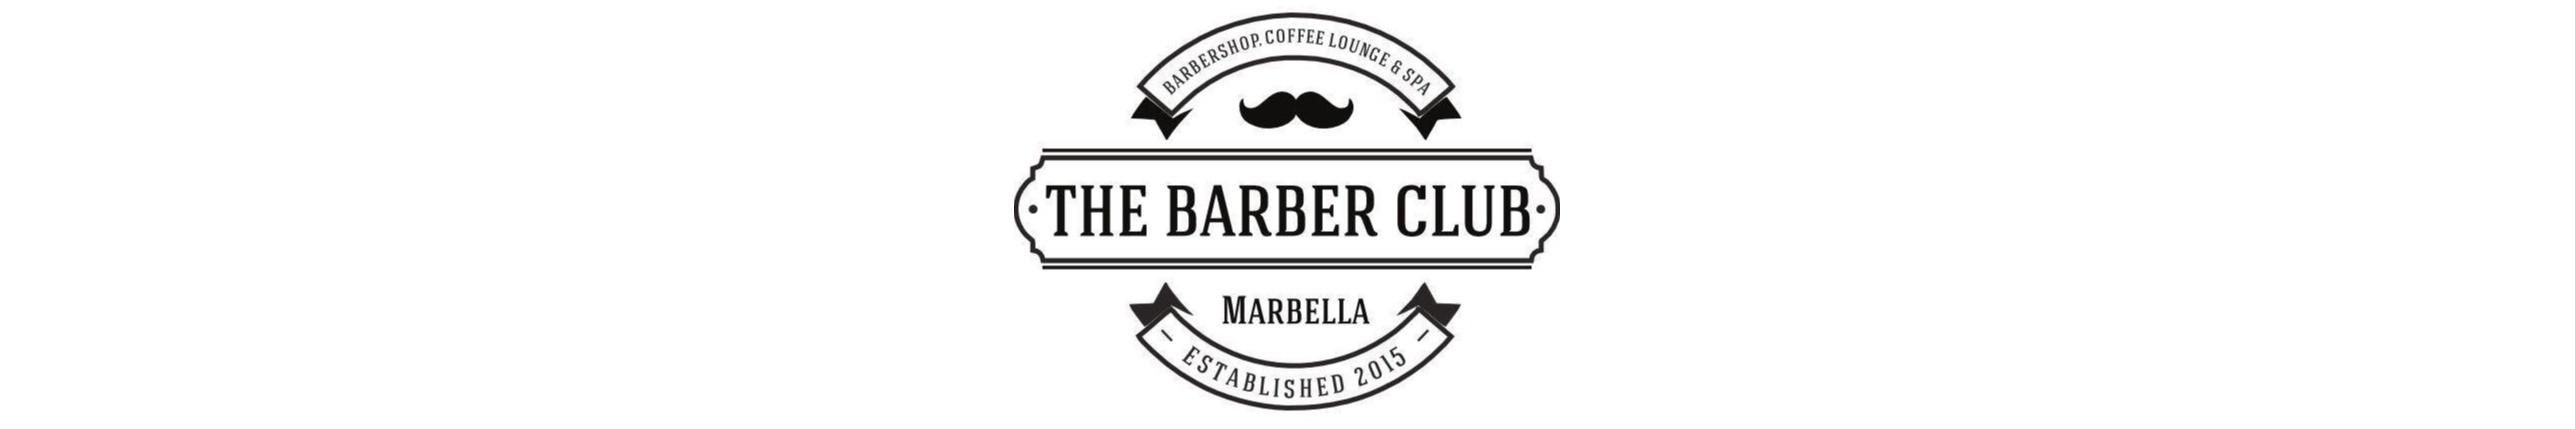 The Barber Club Marbella